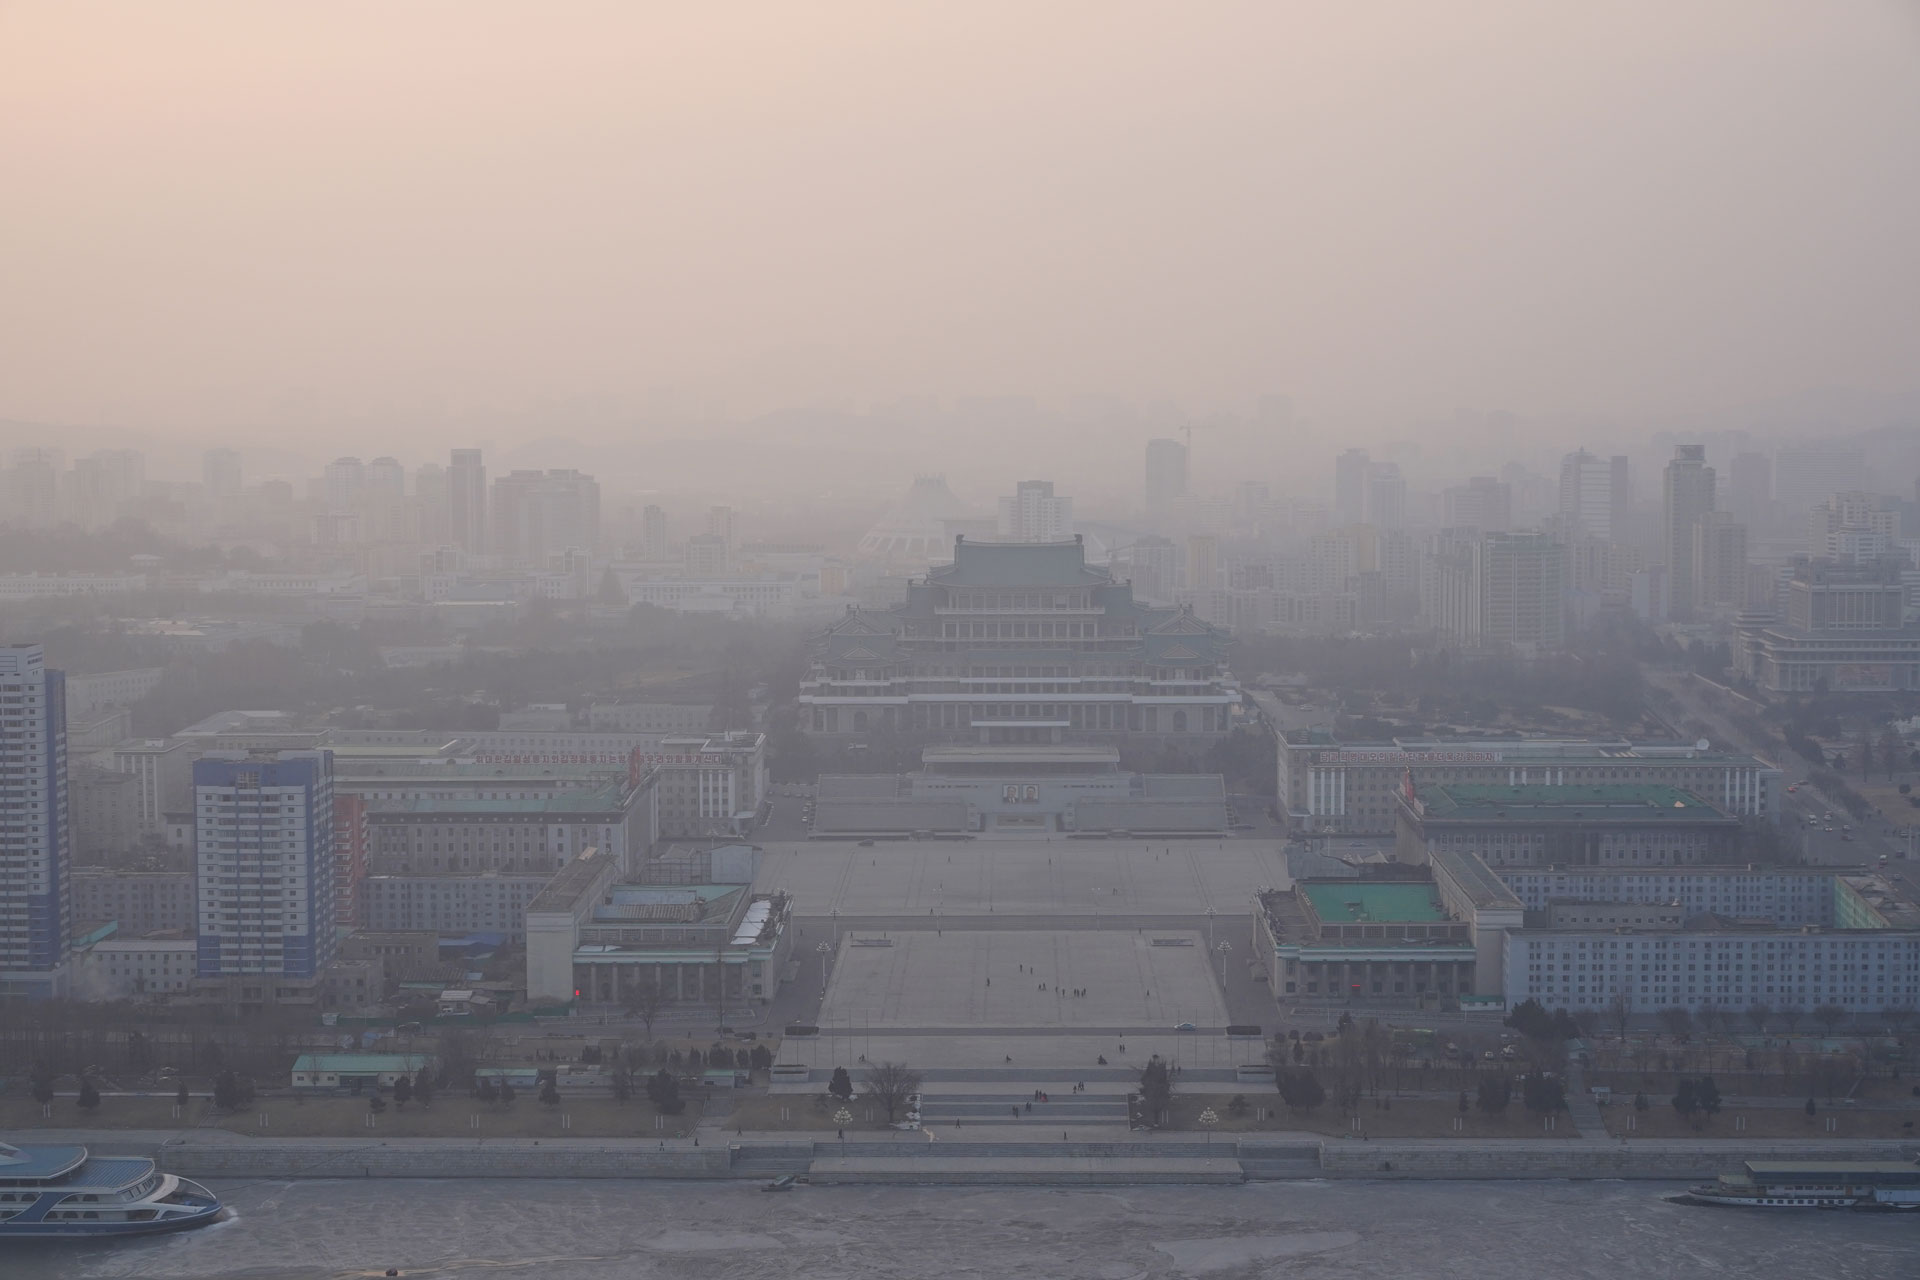 pyongyang-dusk-shot-of-kim-il-sung-square.jpg